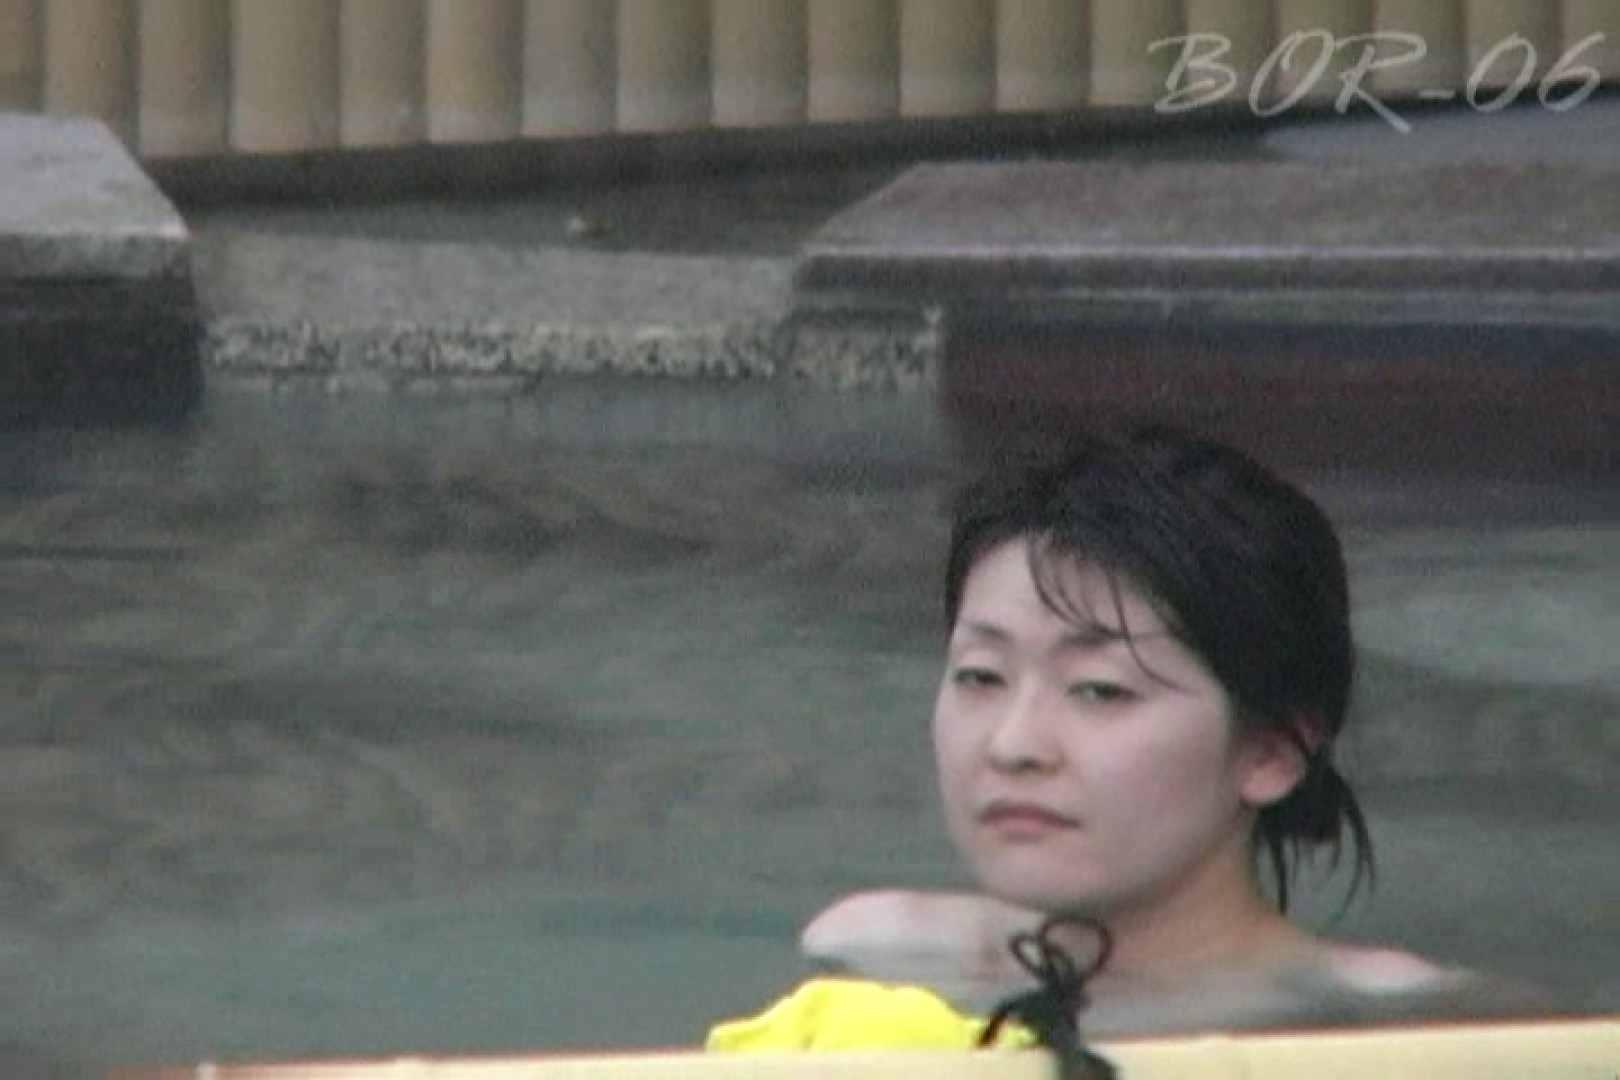 Aquaな露天風呂Vol.523 盗撮映像  93Pix 82